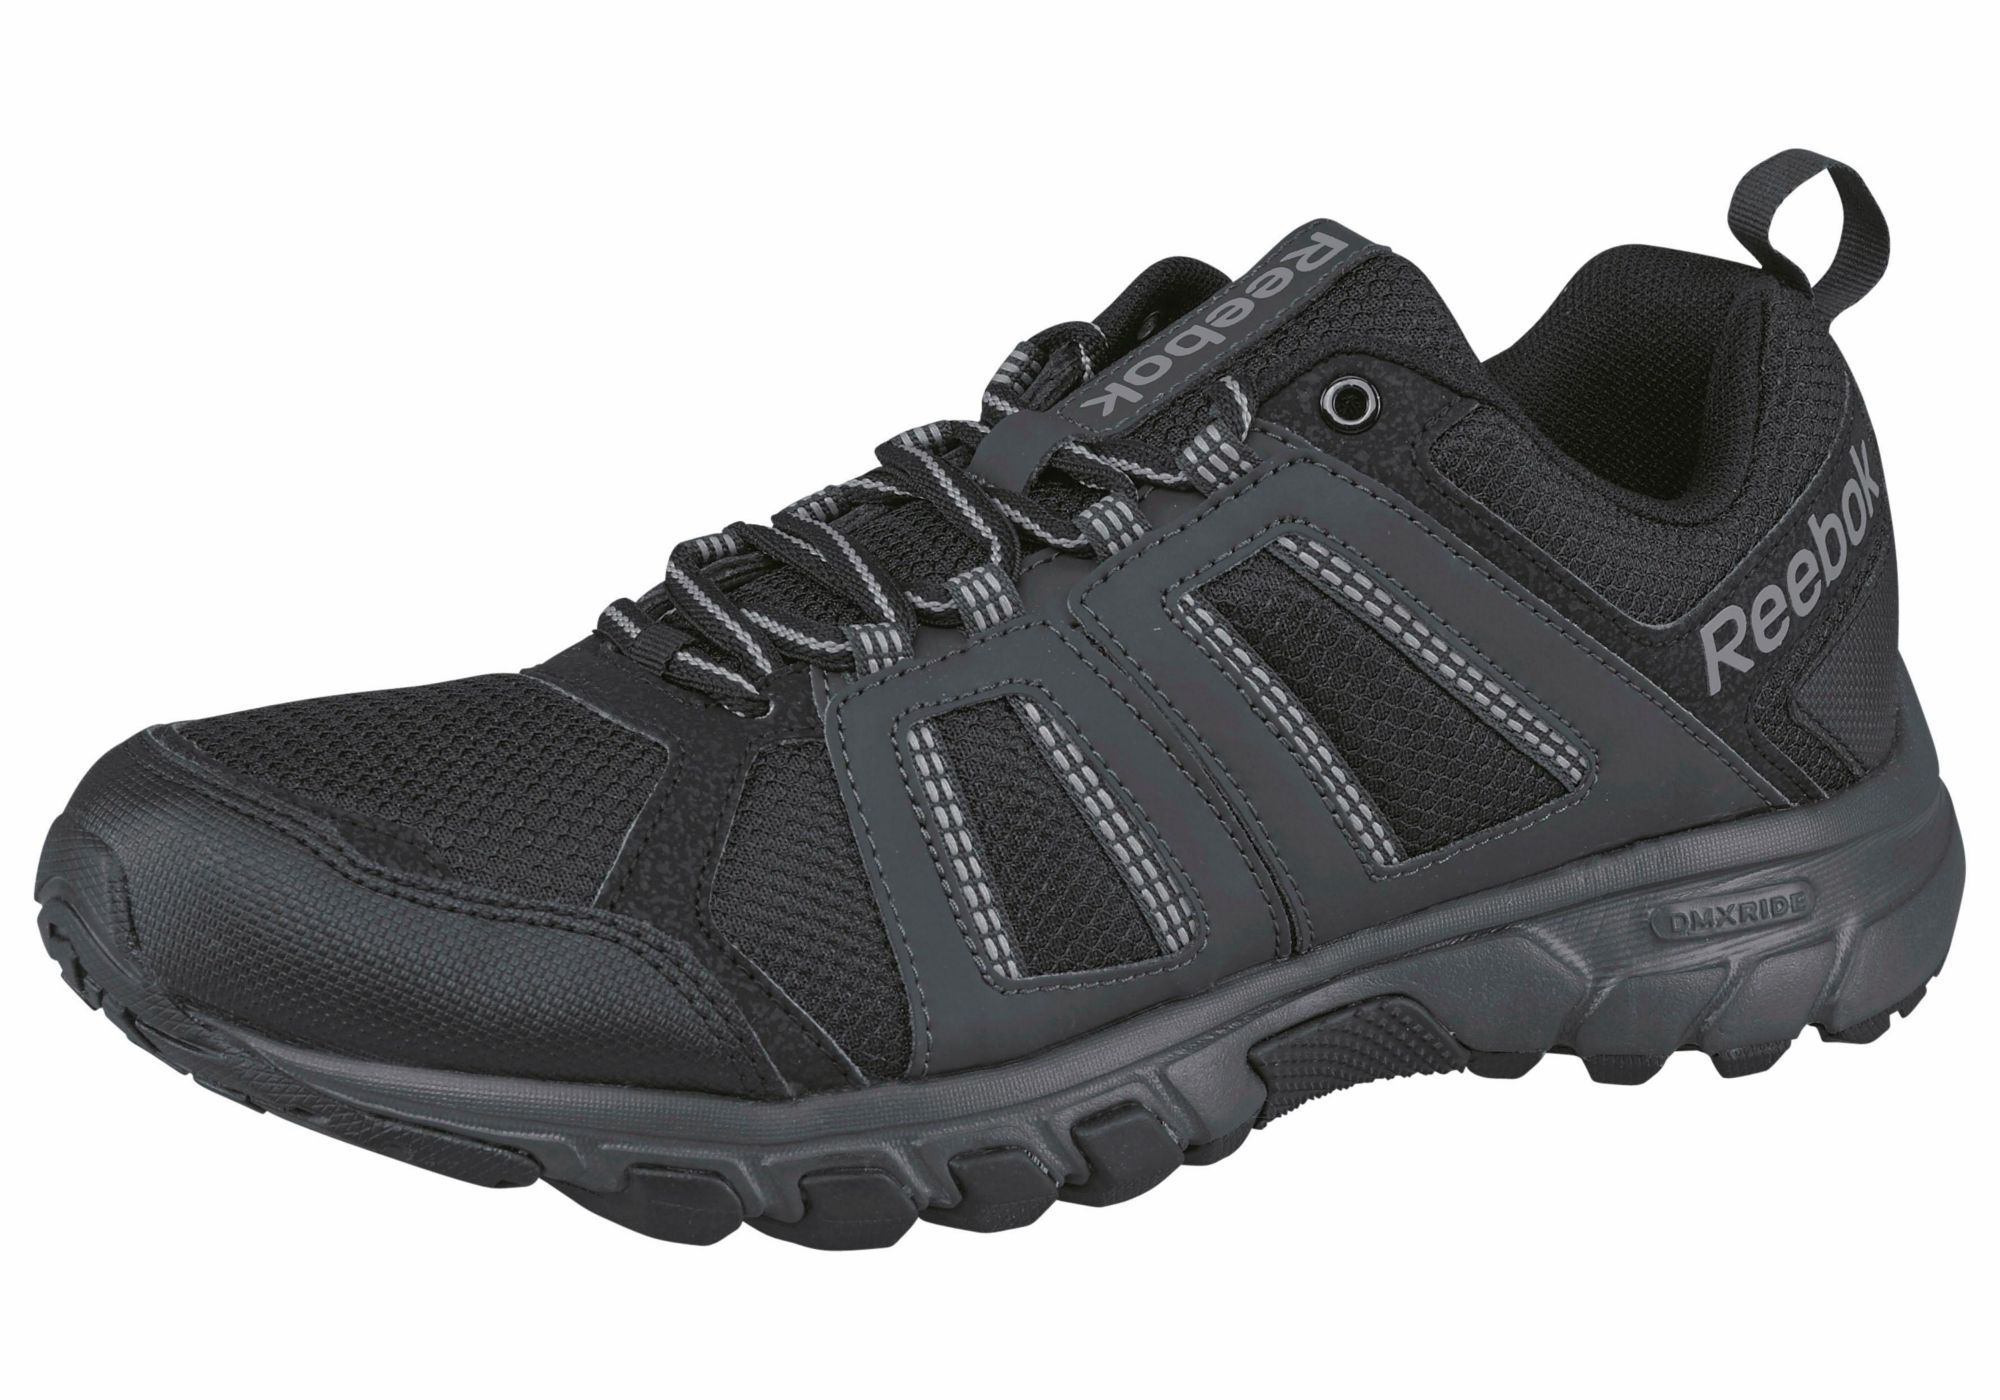 REEBOK Reebok Walkingschuh »DMX Ride Comfort RS 3.0«